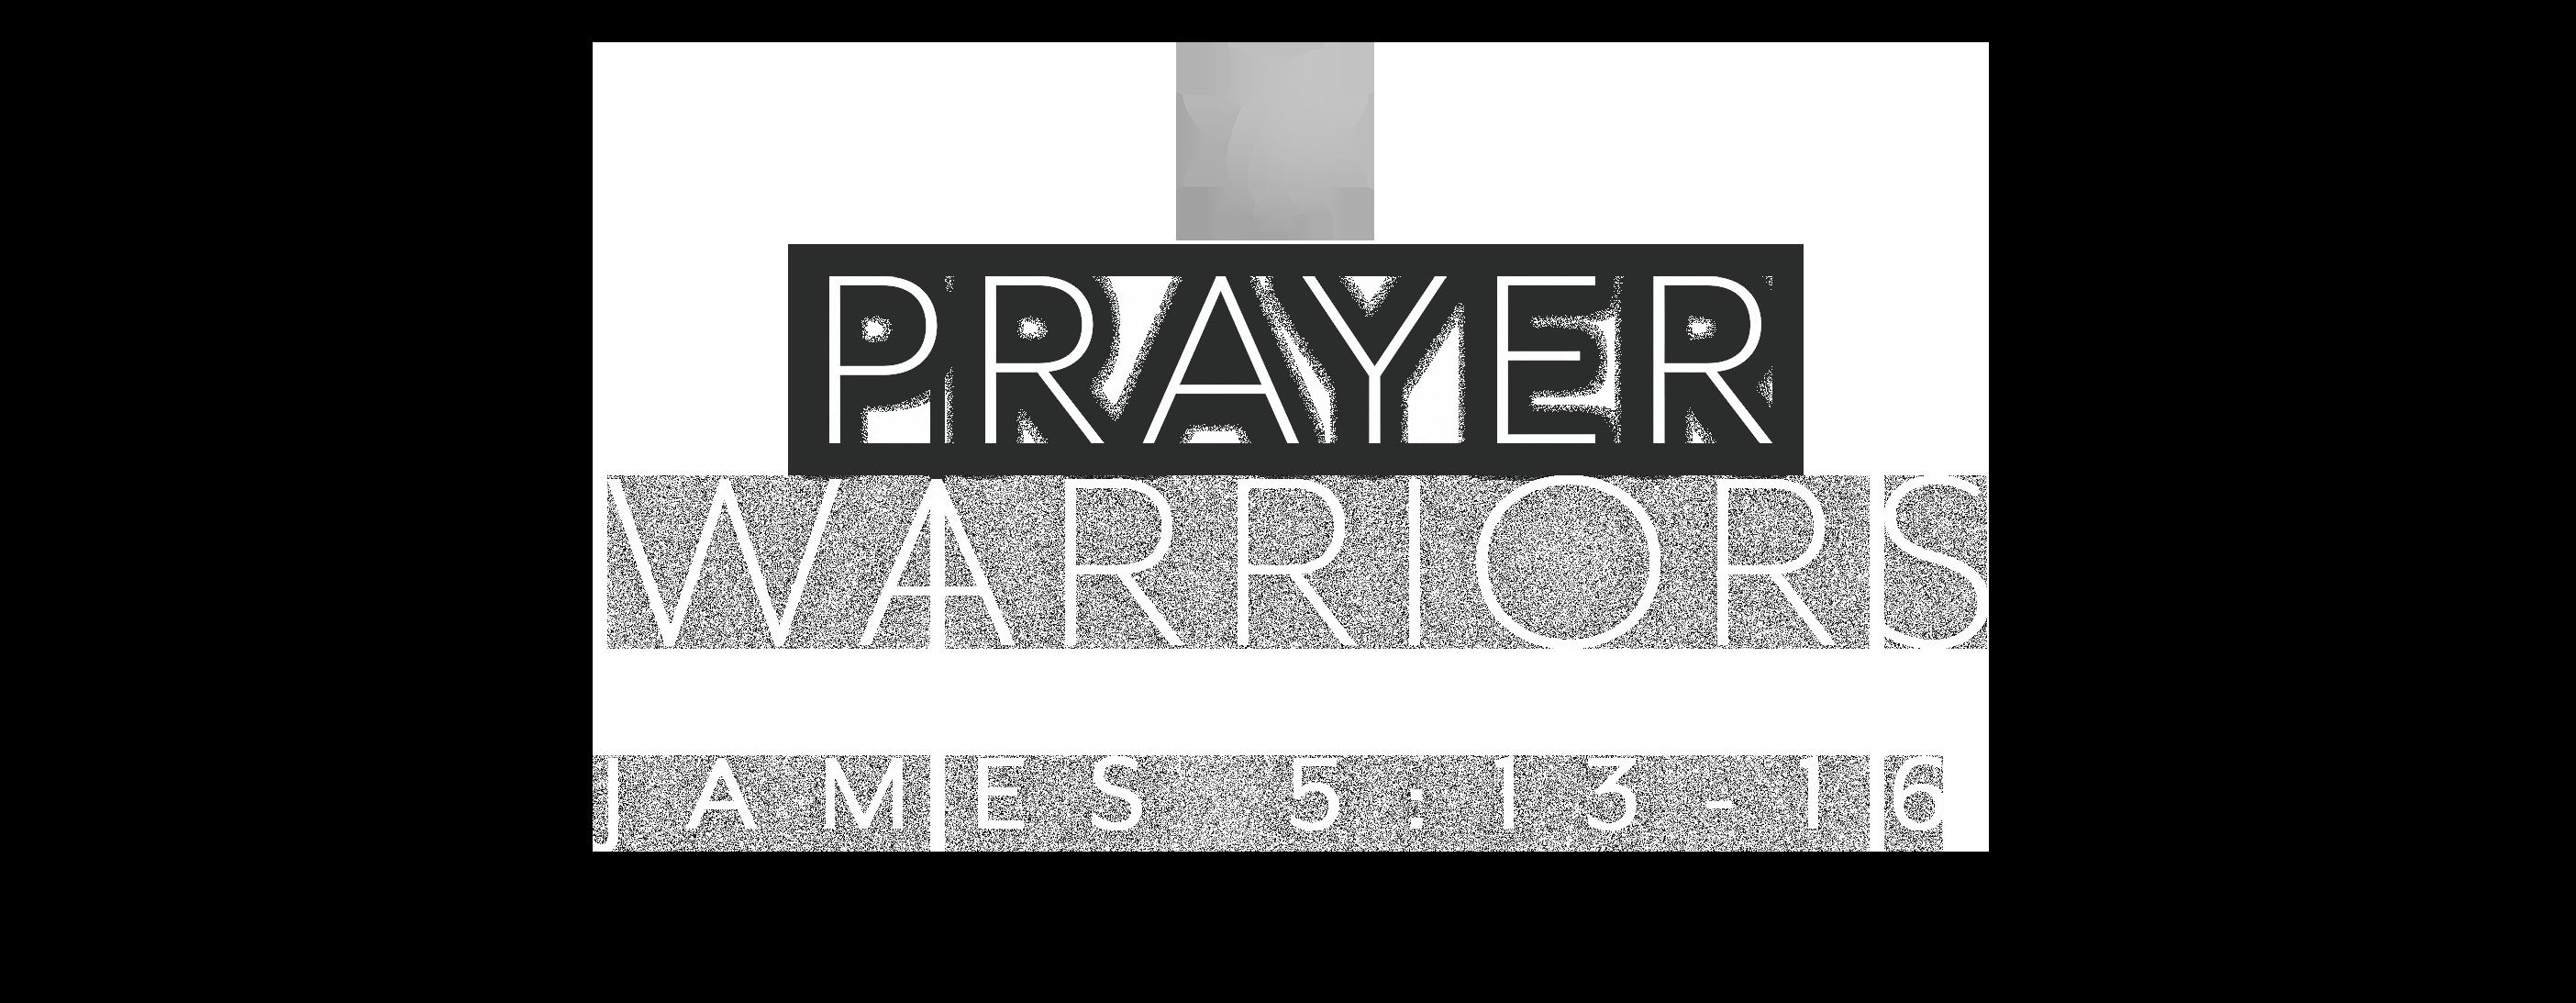 Top Graphic Prayer W5arrior 2